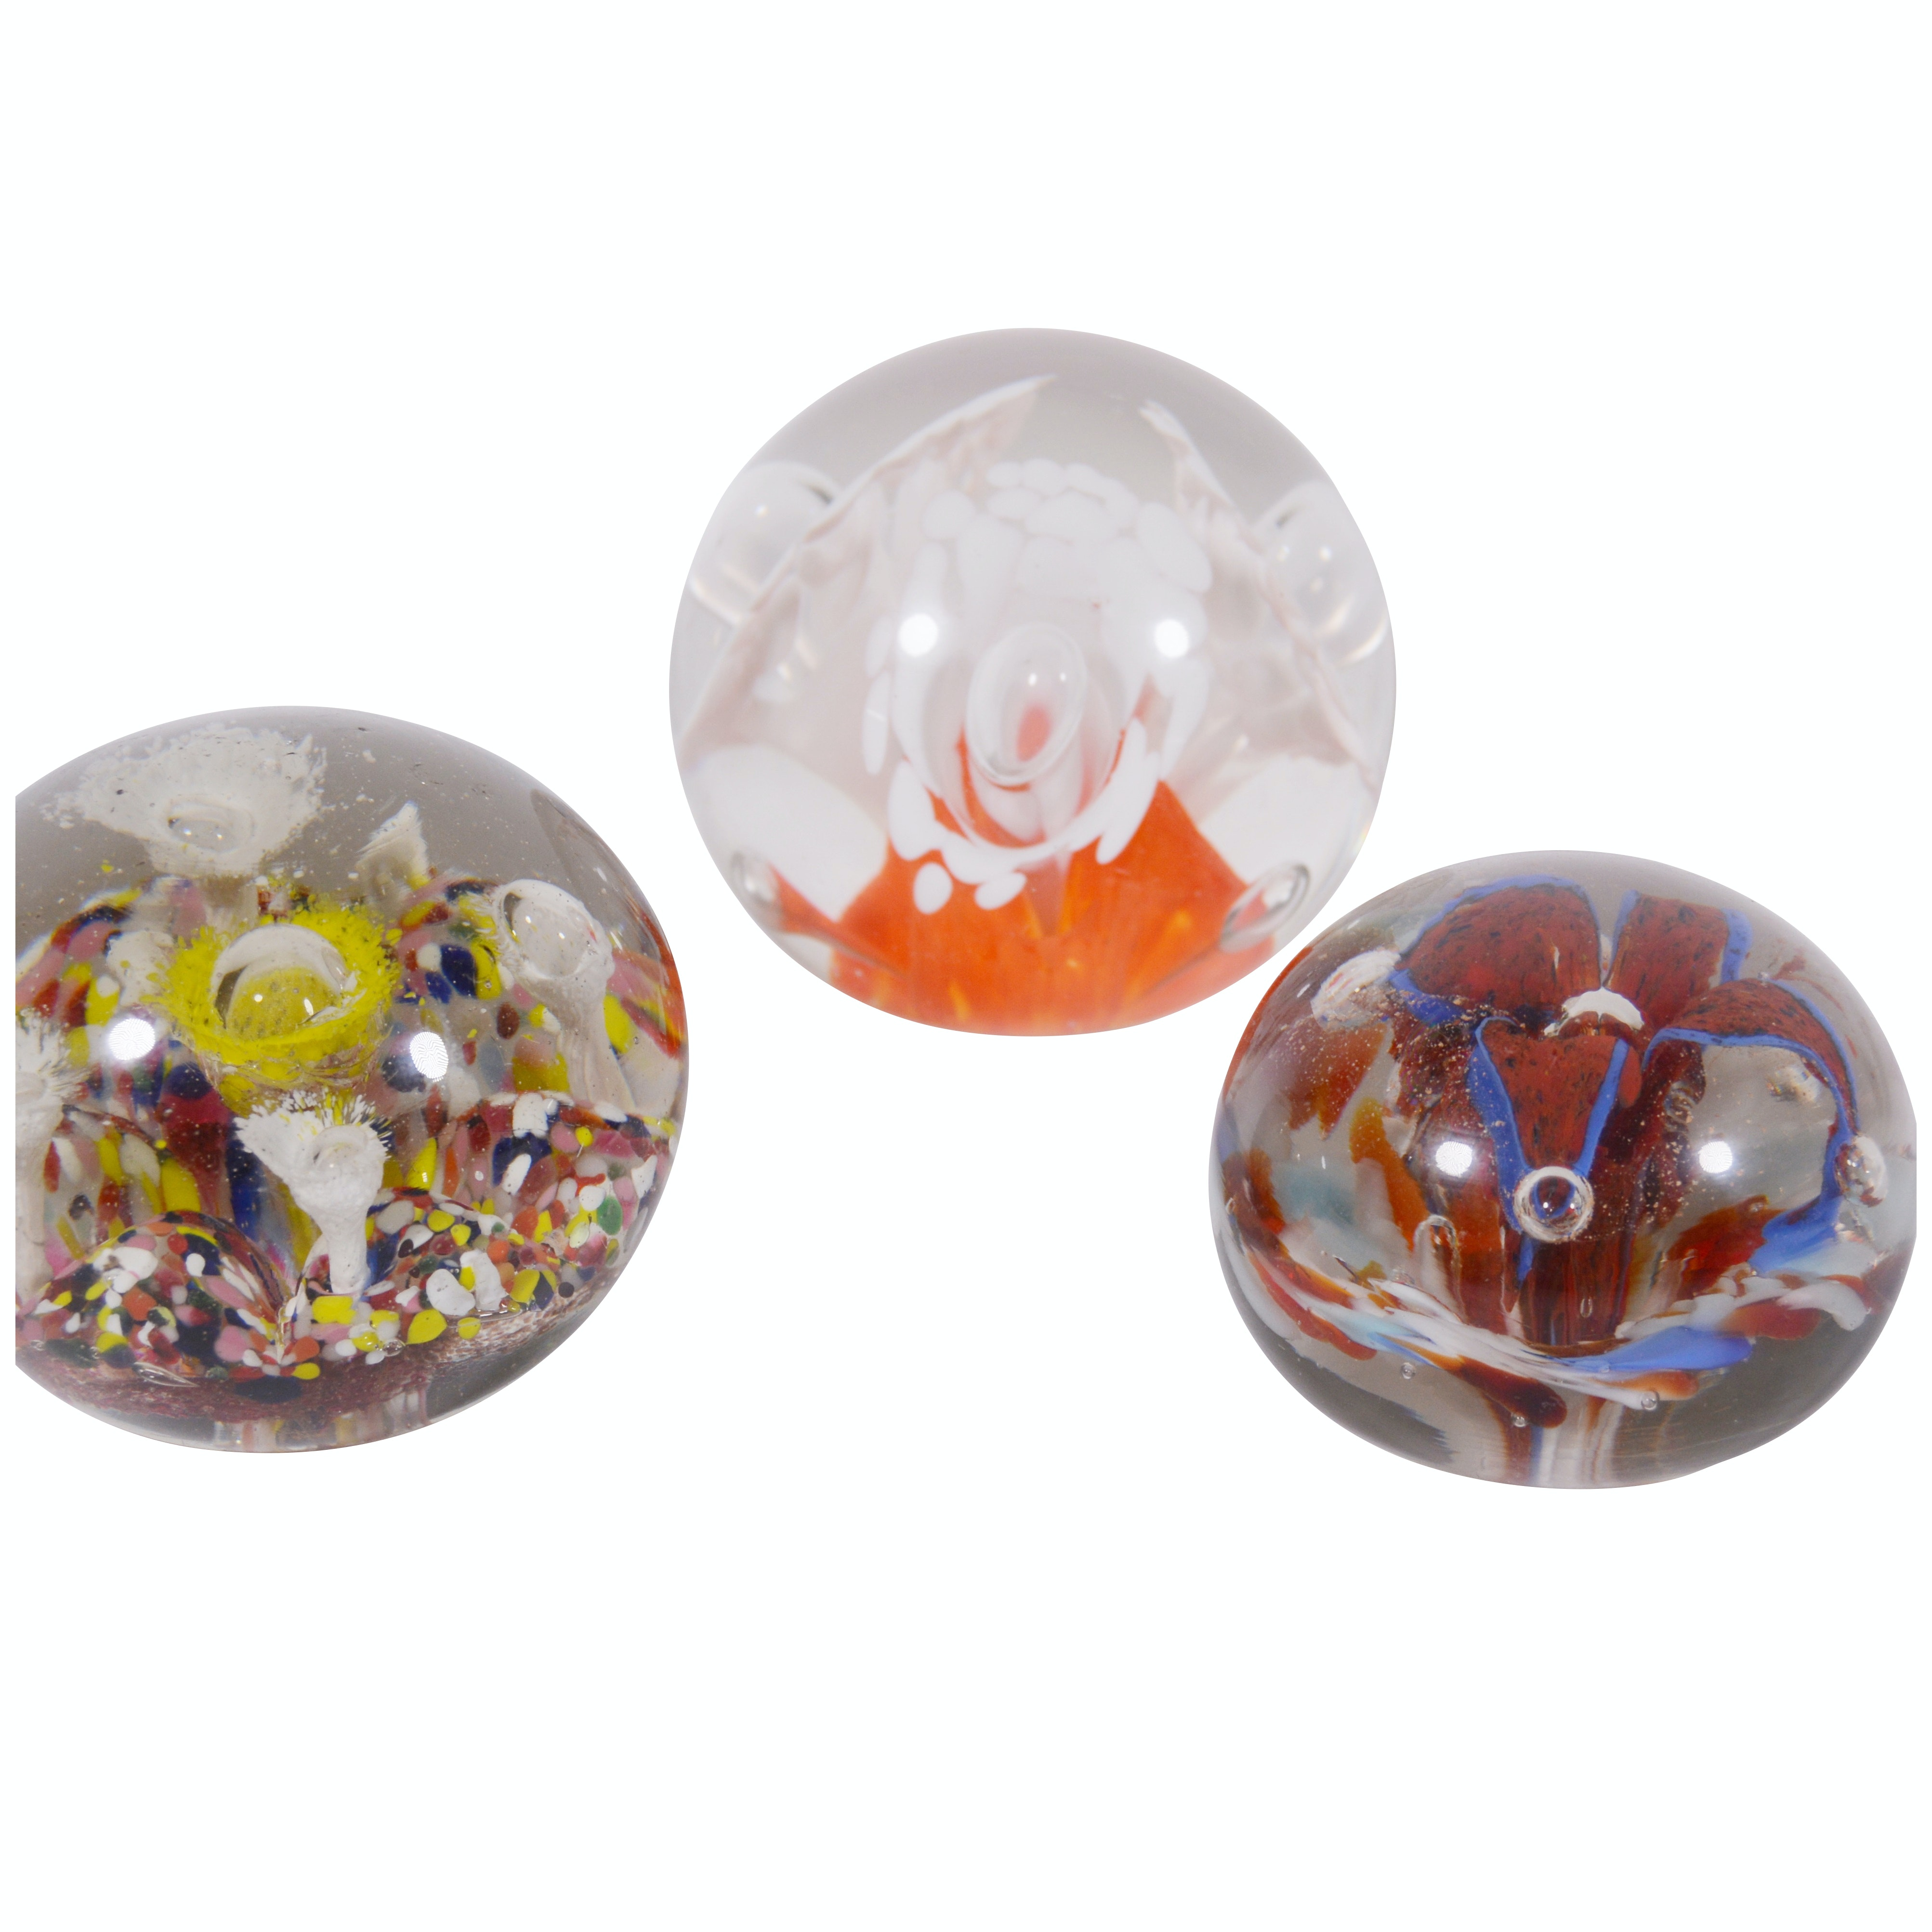 Hand-Blown Art Glass and Millefiori Paperweights